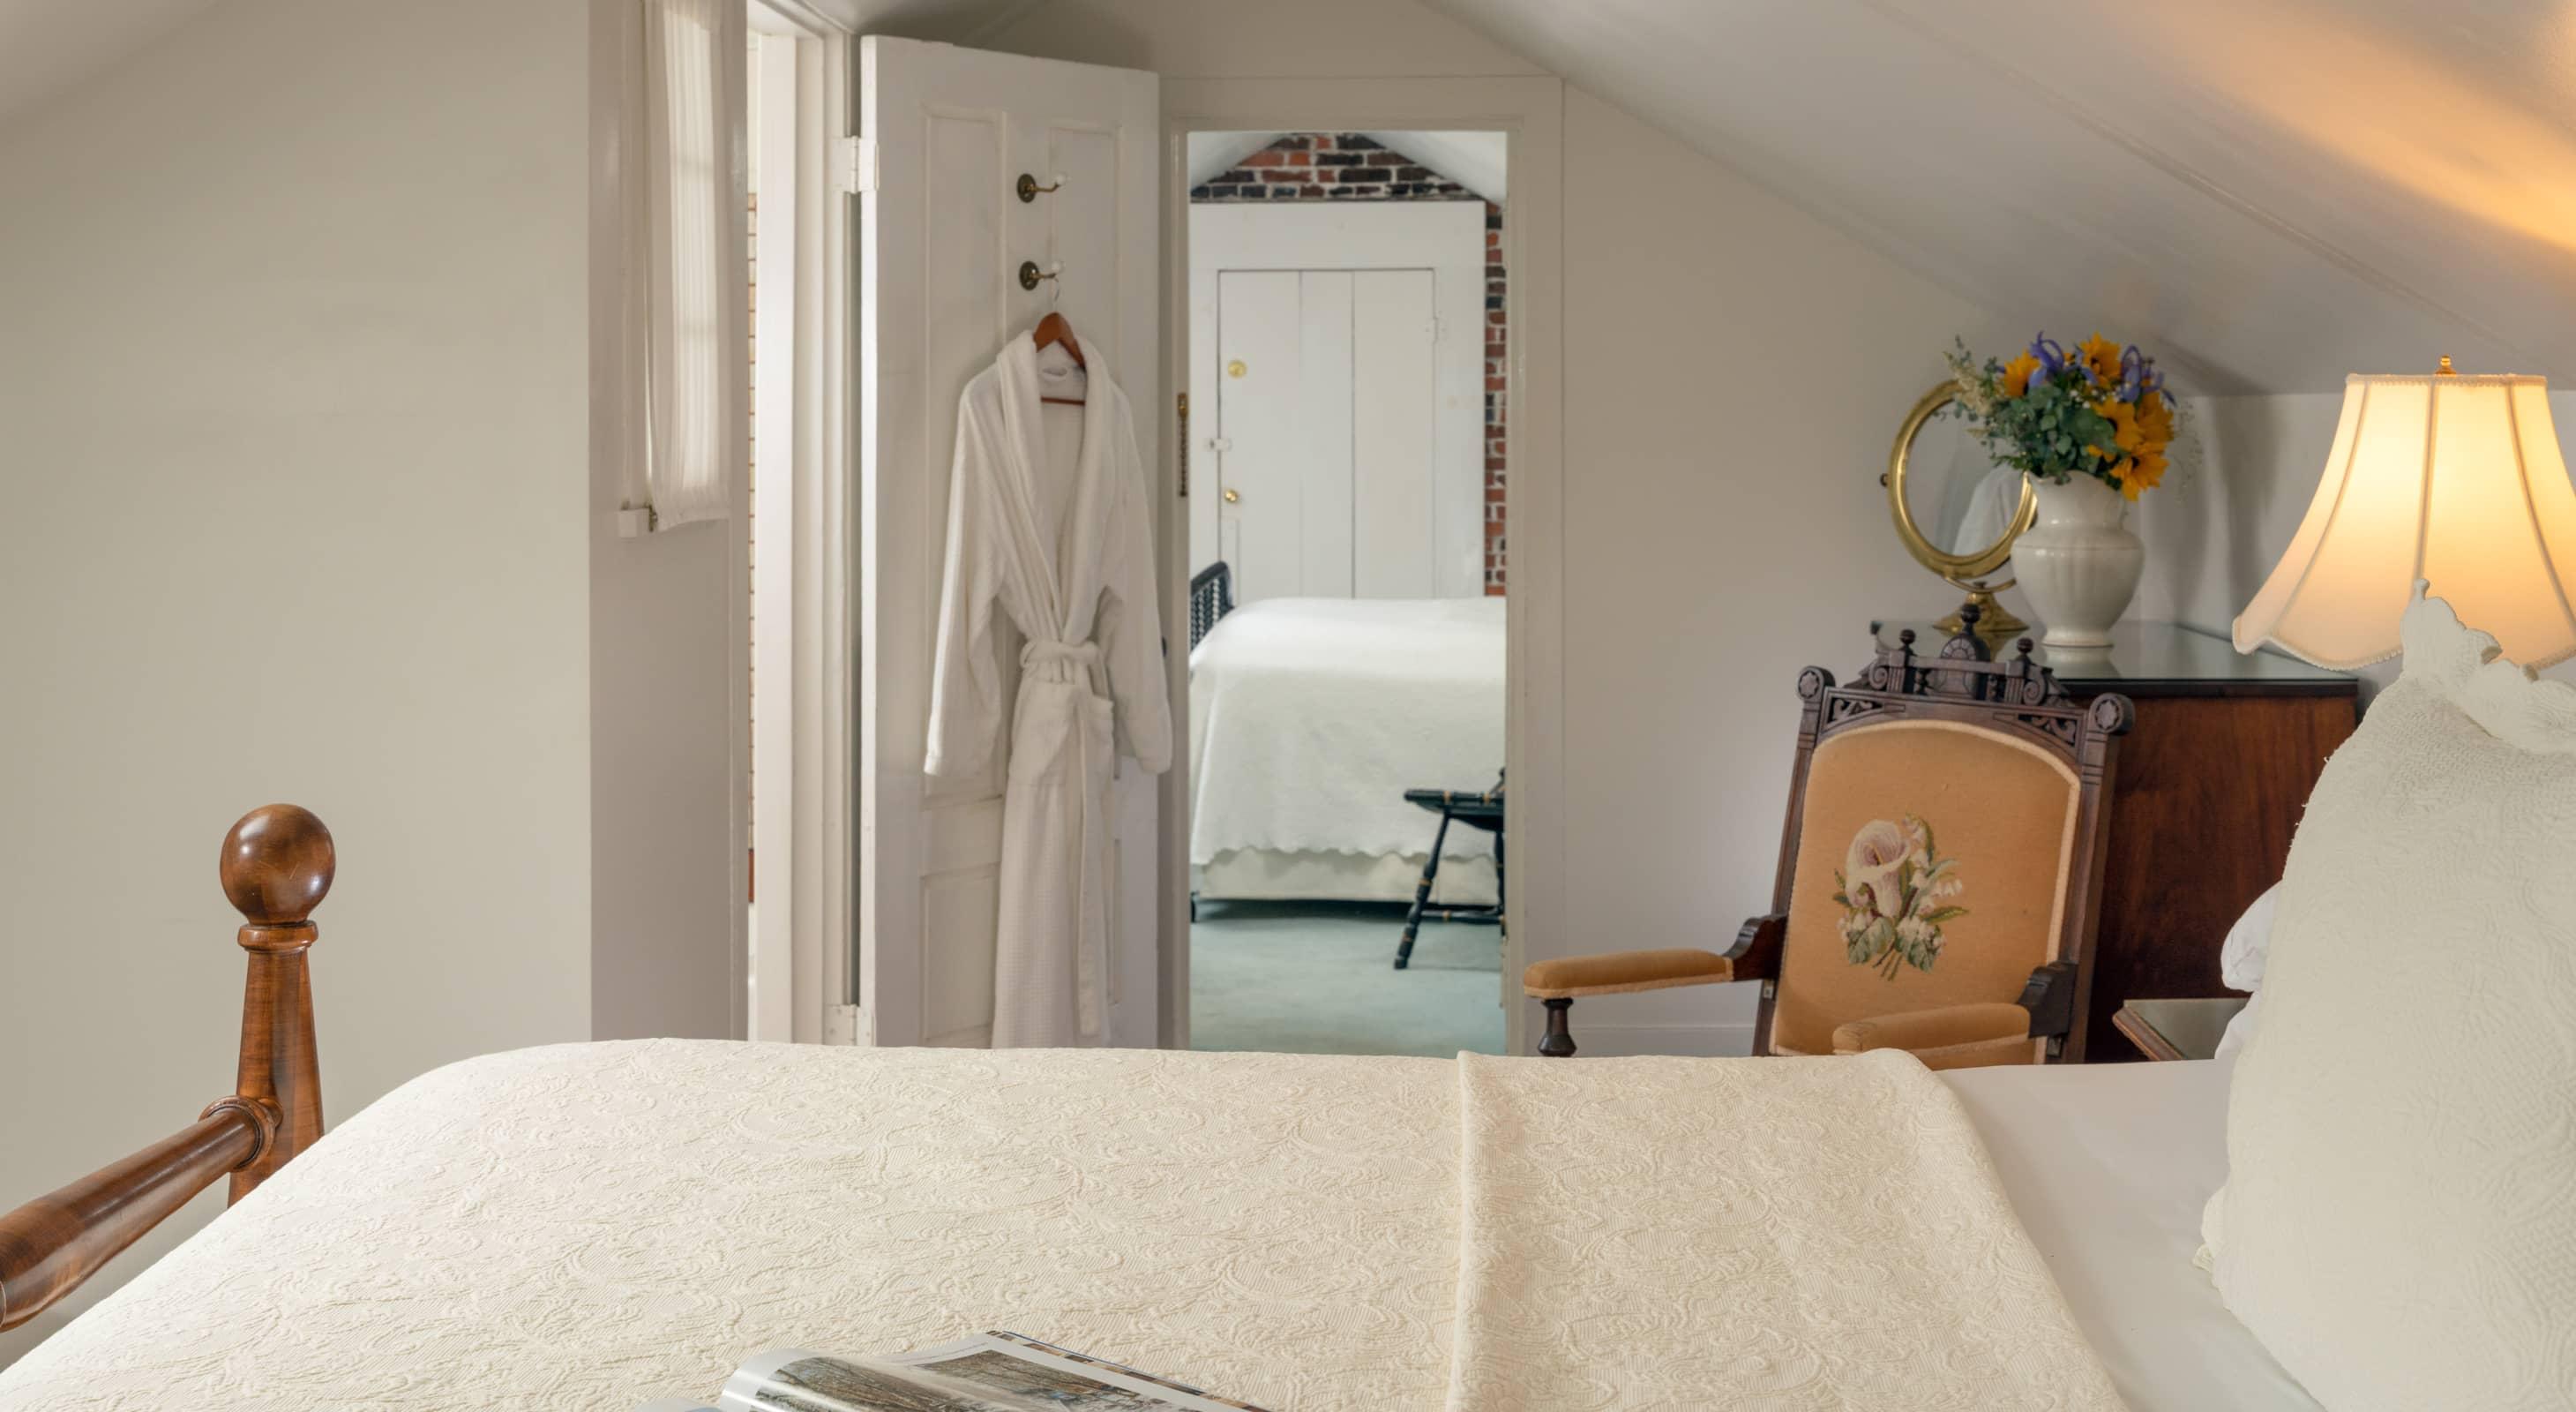 Room 9 at a Historic Maine Coast B&B